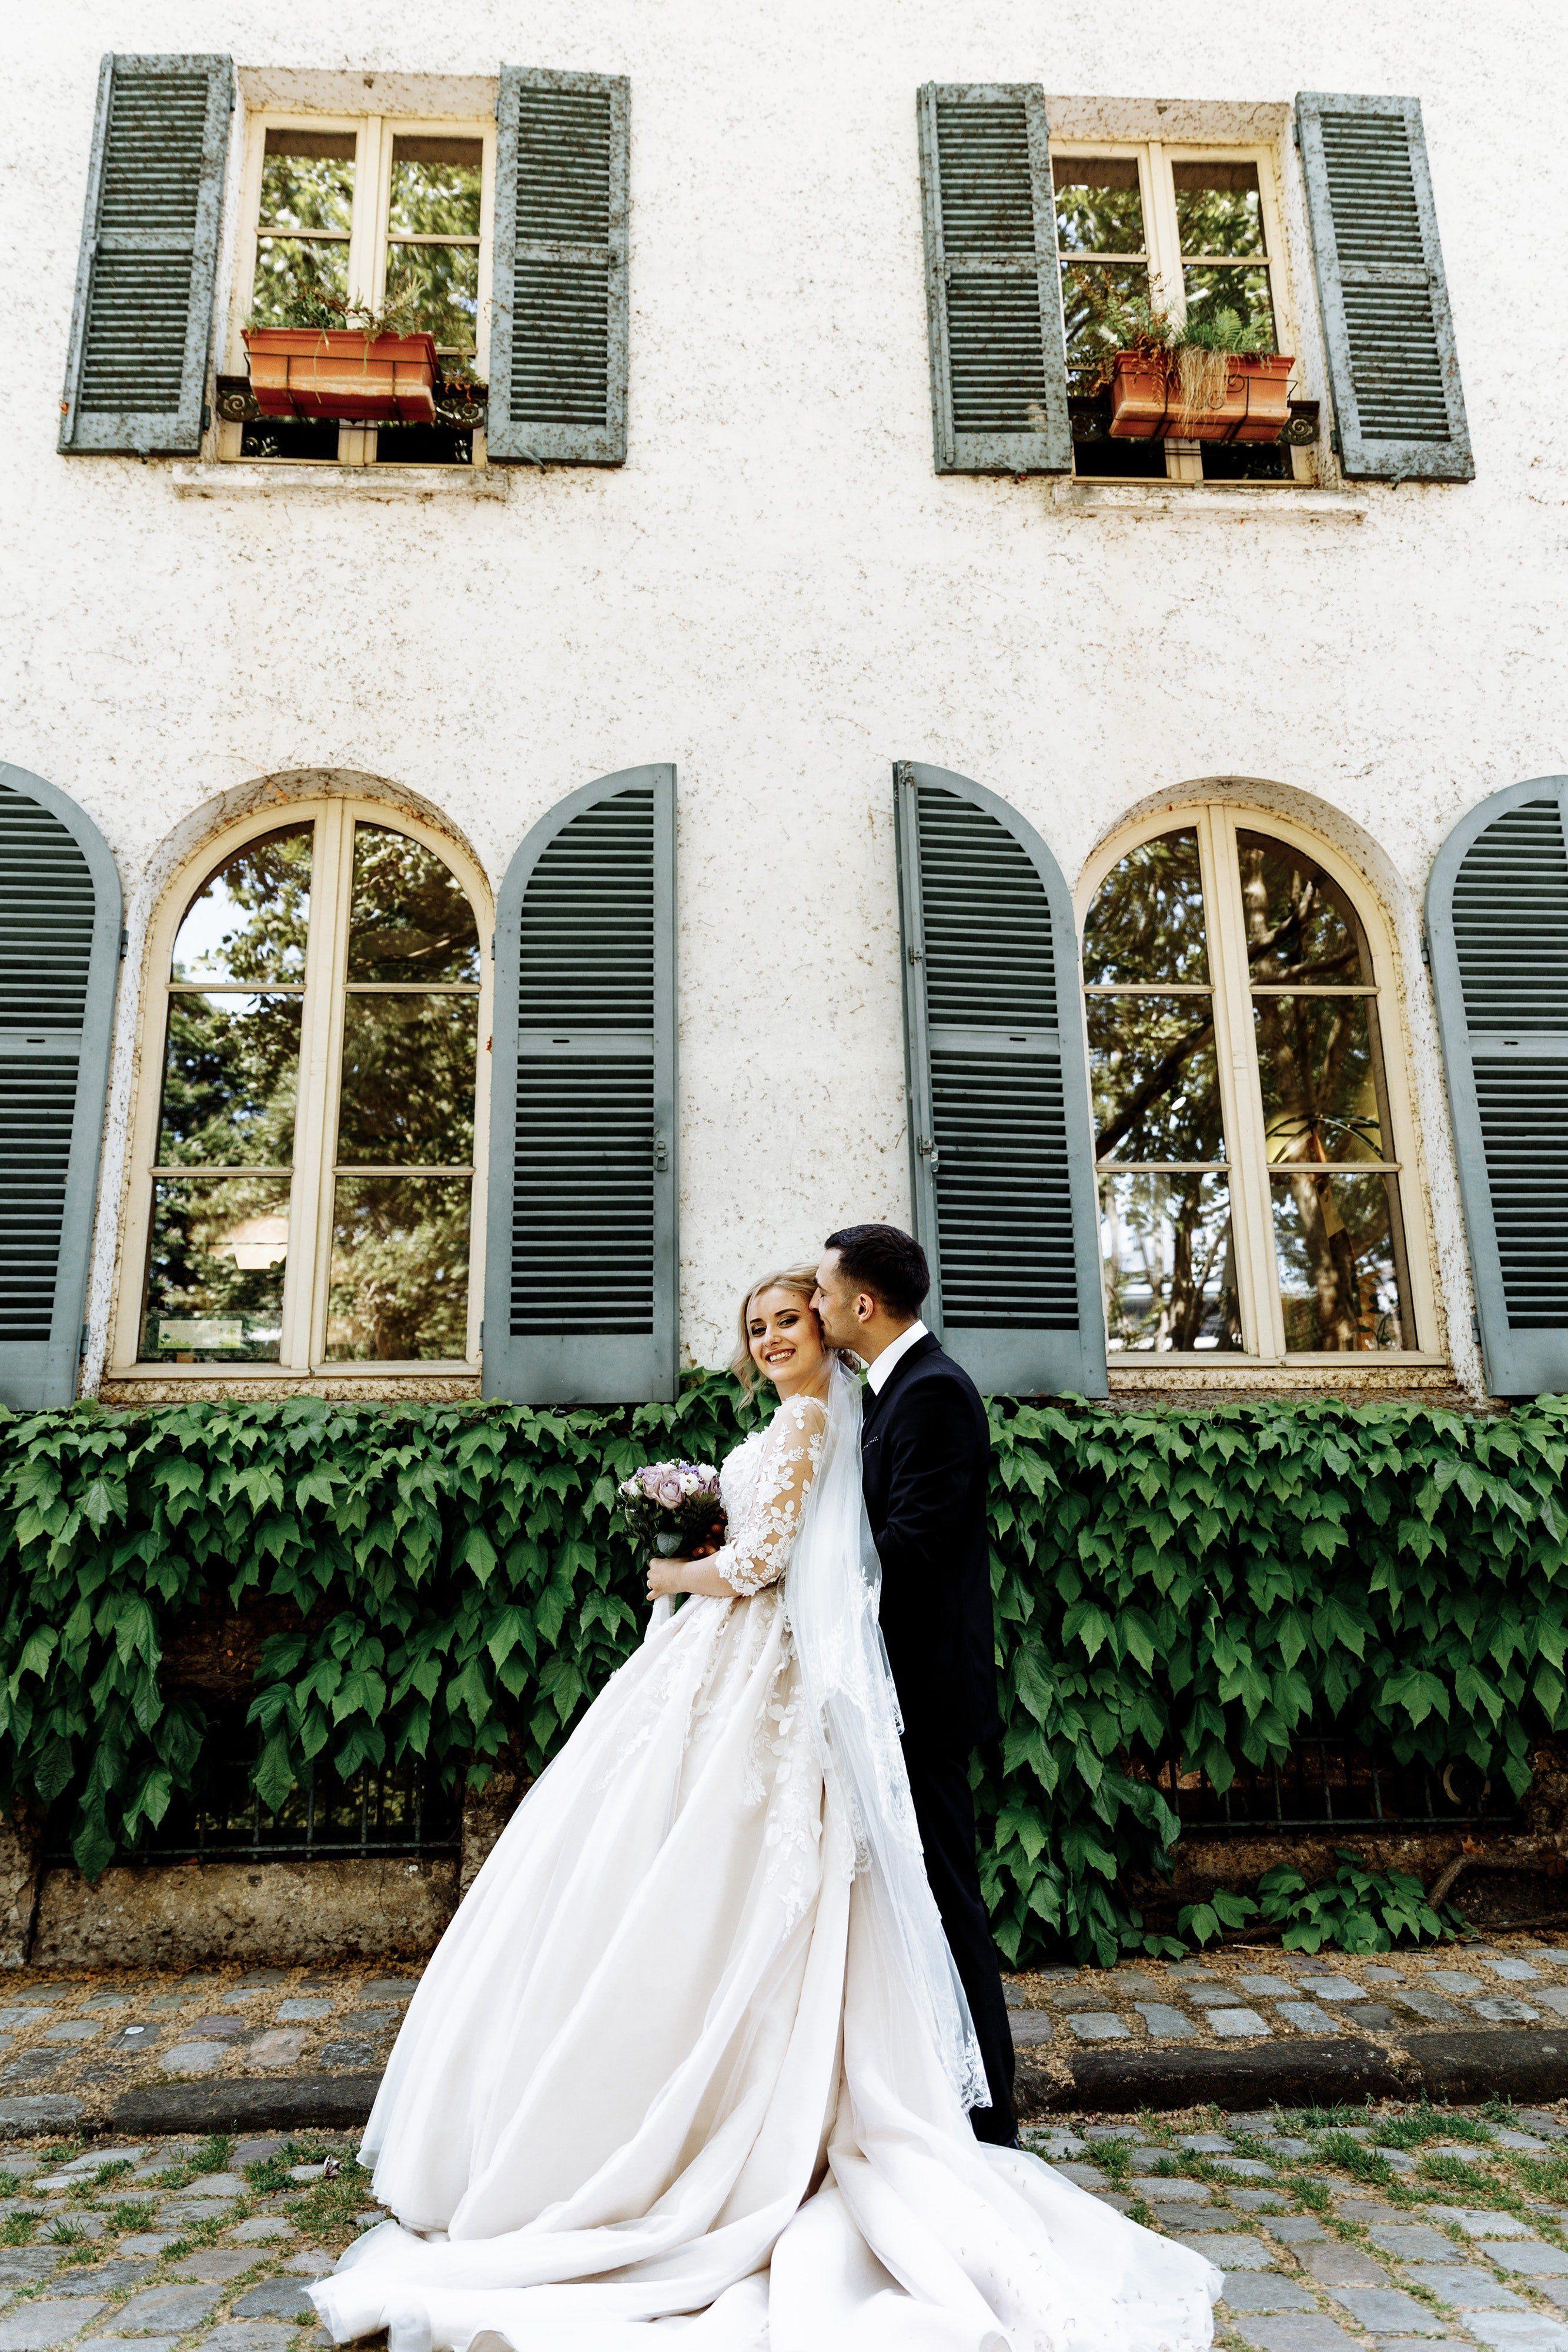 wedding photography planning tips